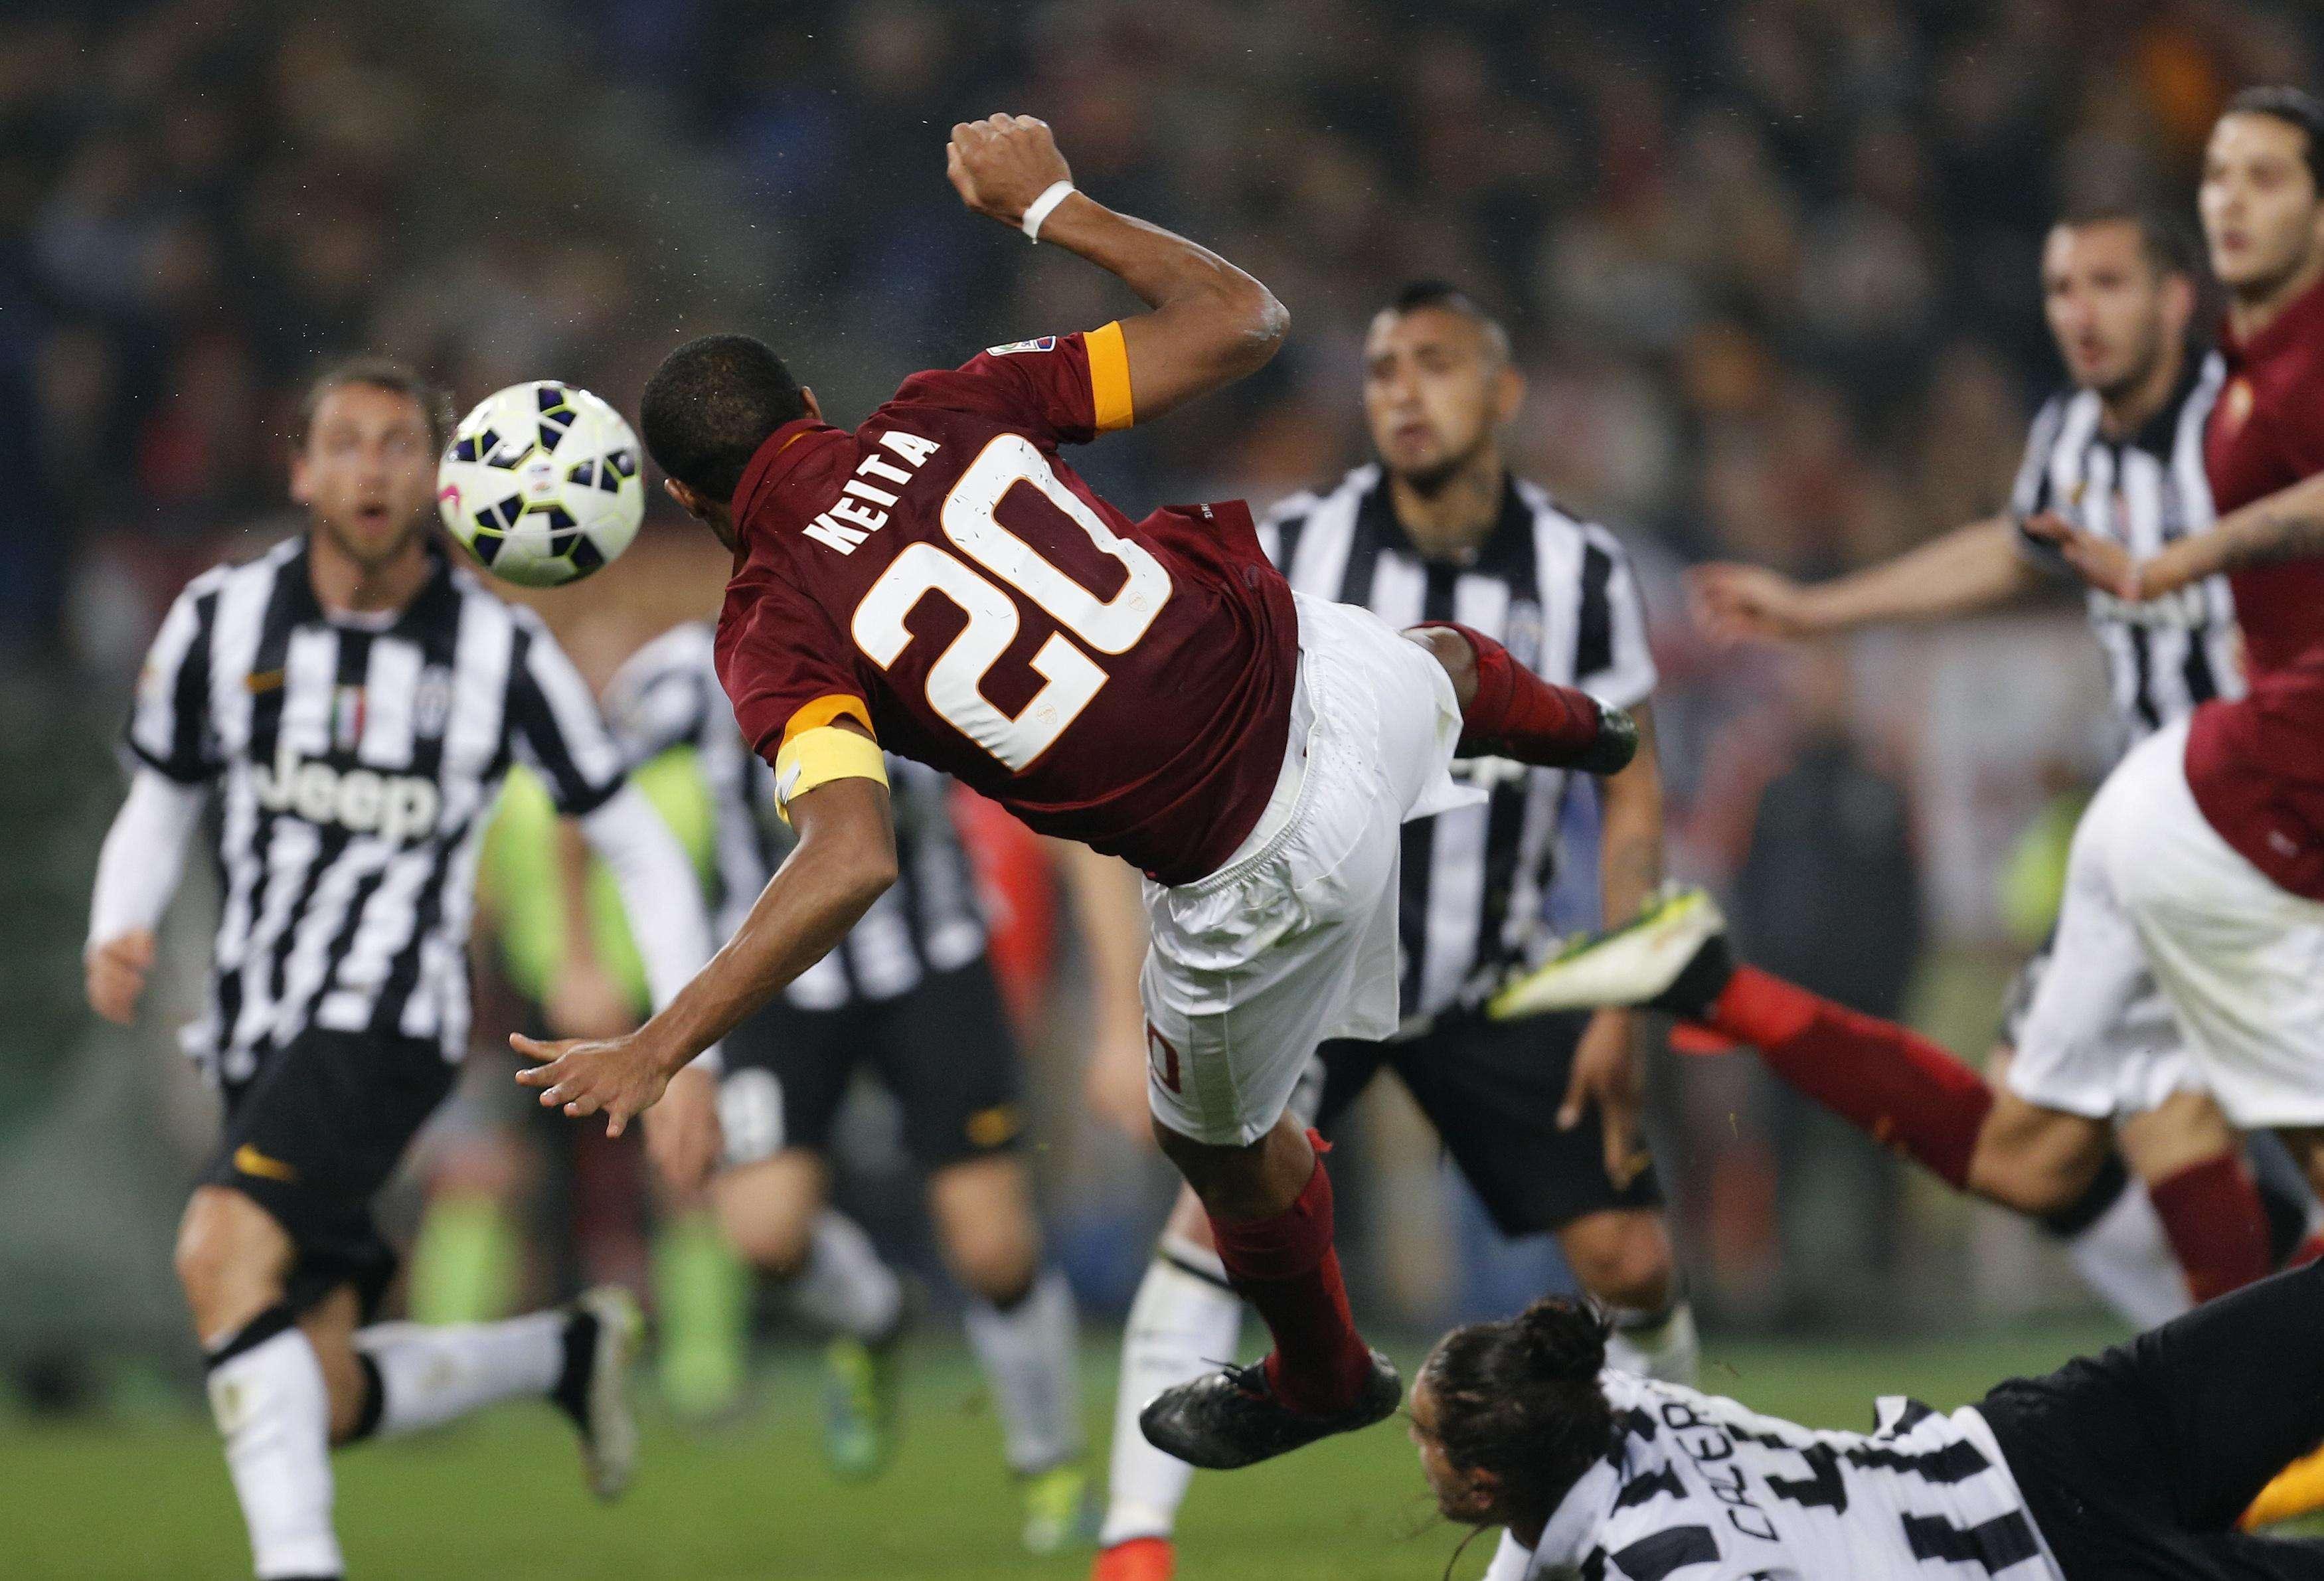 Keita marca o gol de empate para a Roma Foto: Giampiero Sposito/Reuters